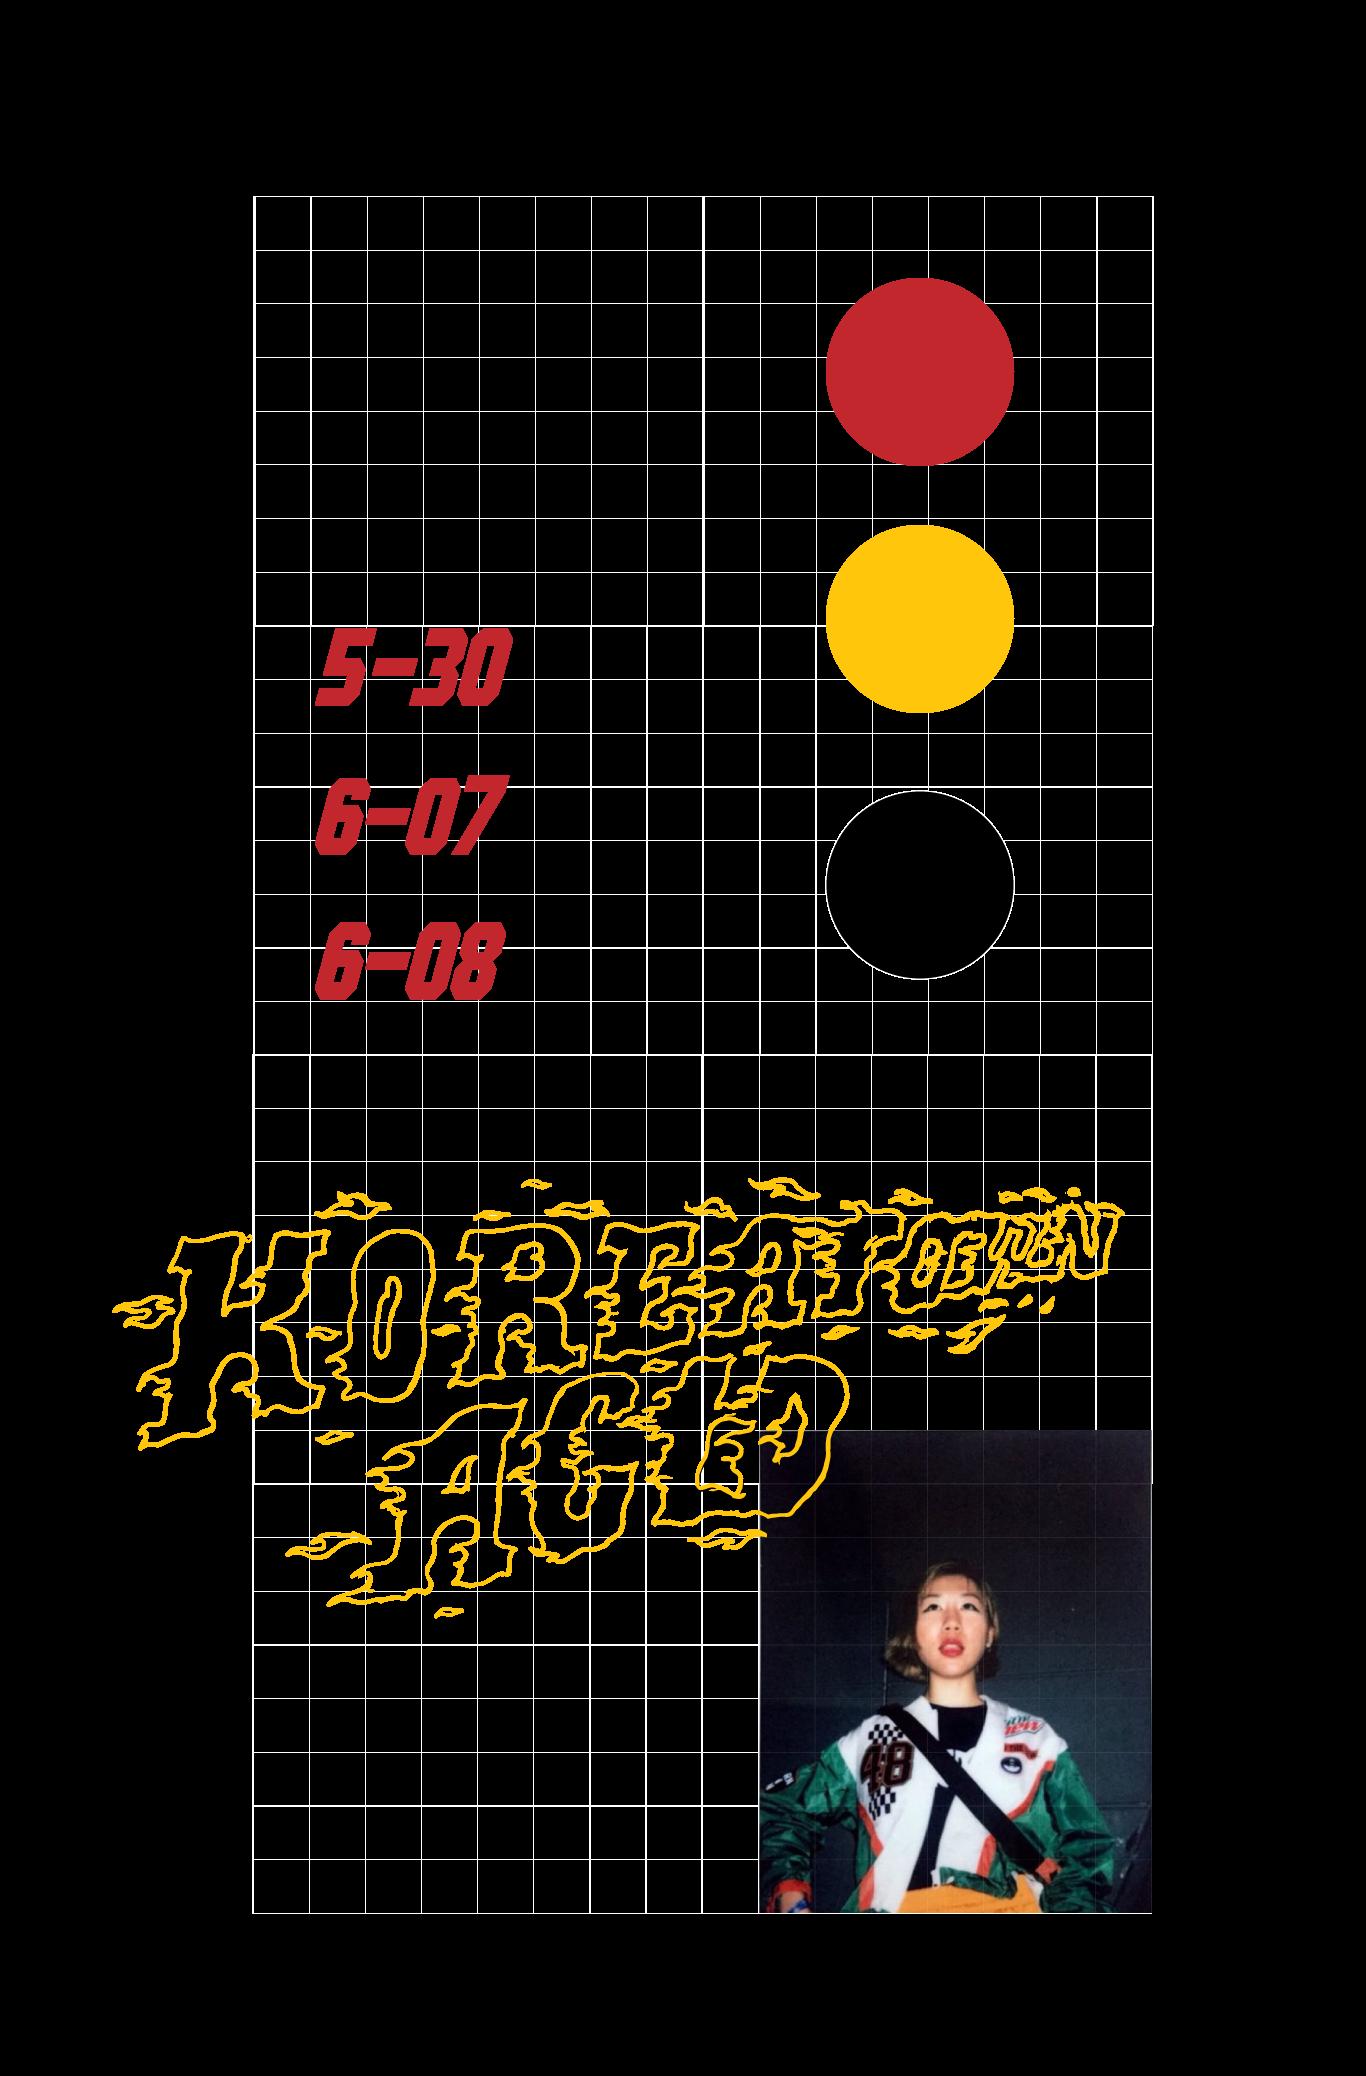 KTS-graph.png